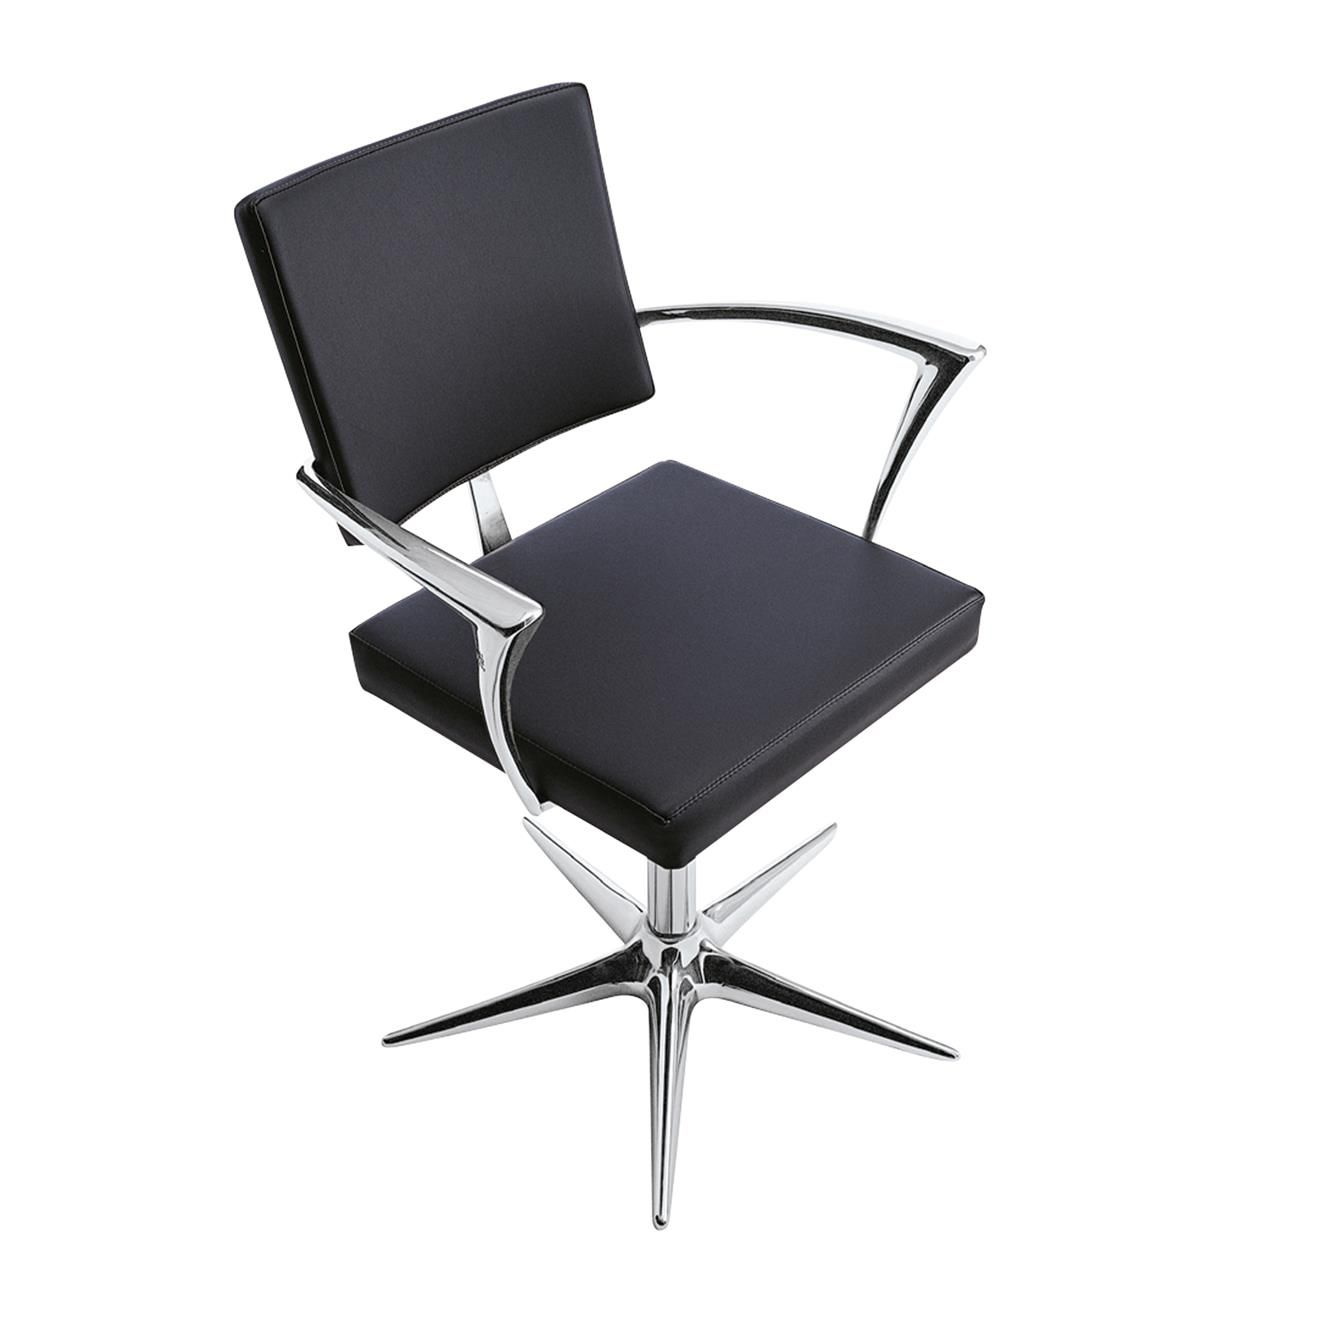 Gamma Bross Styling Chair Onedia Salon Chairs Salon Styling Chairs Chair